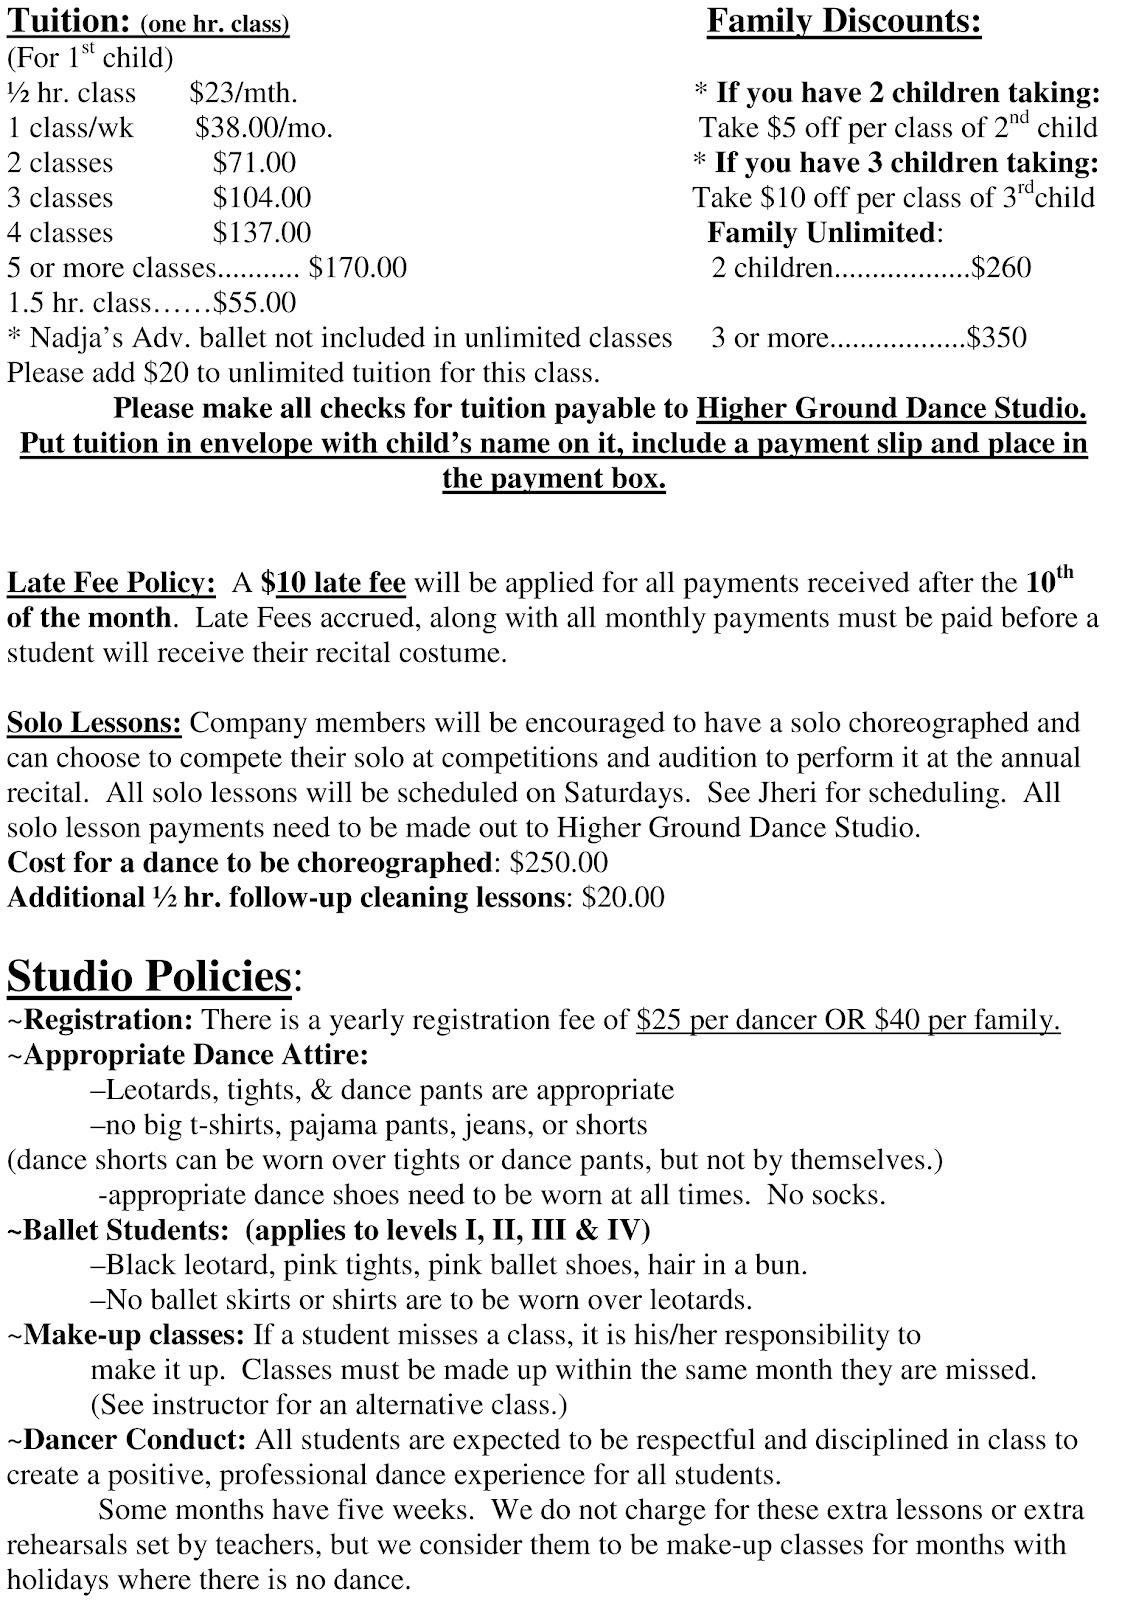 dance school registration form template free - higher ground dance studio registration form and dance